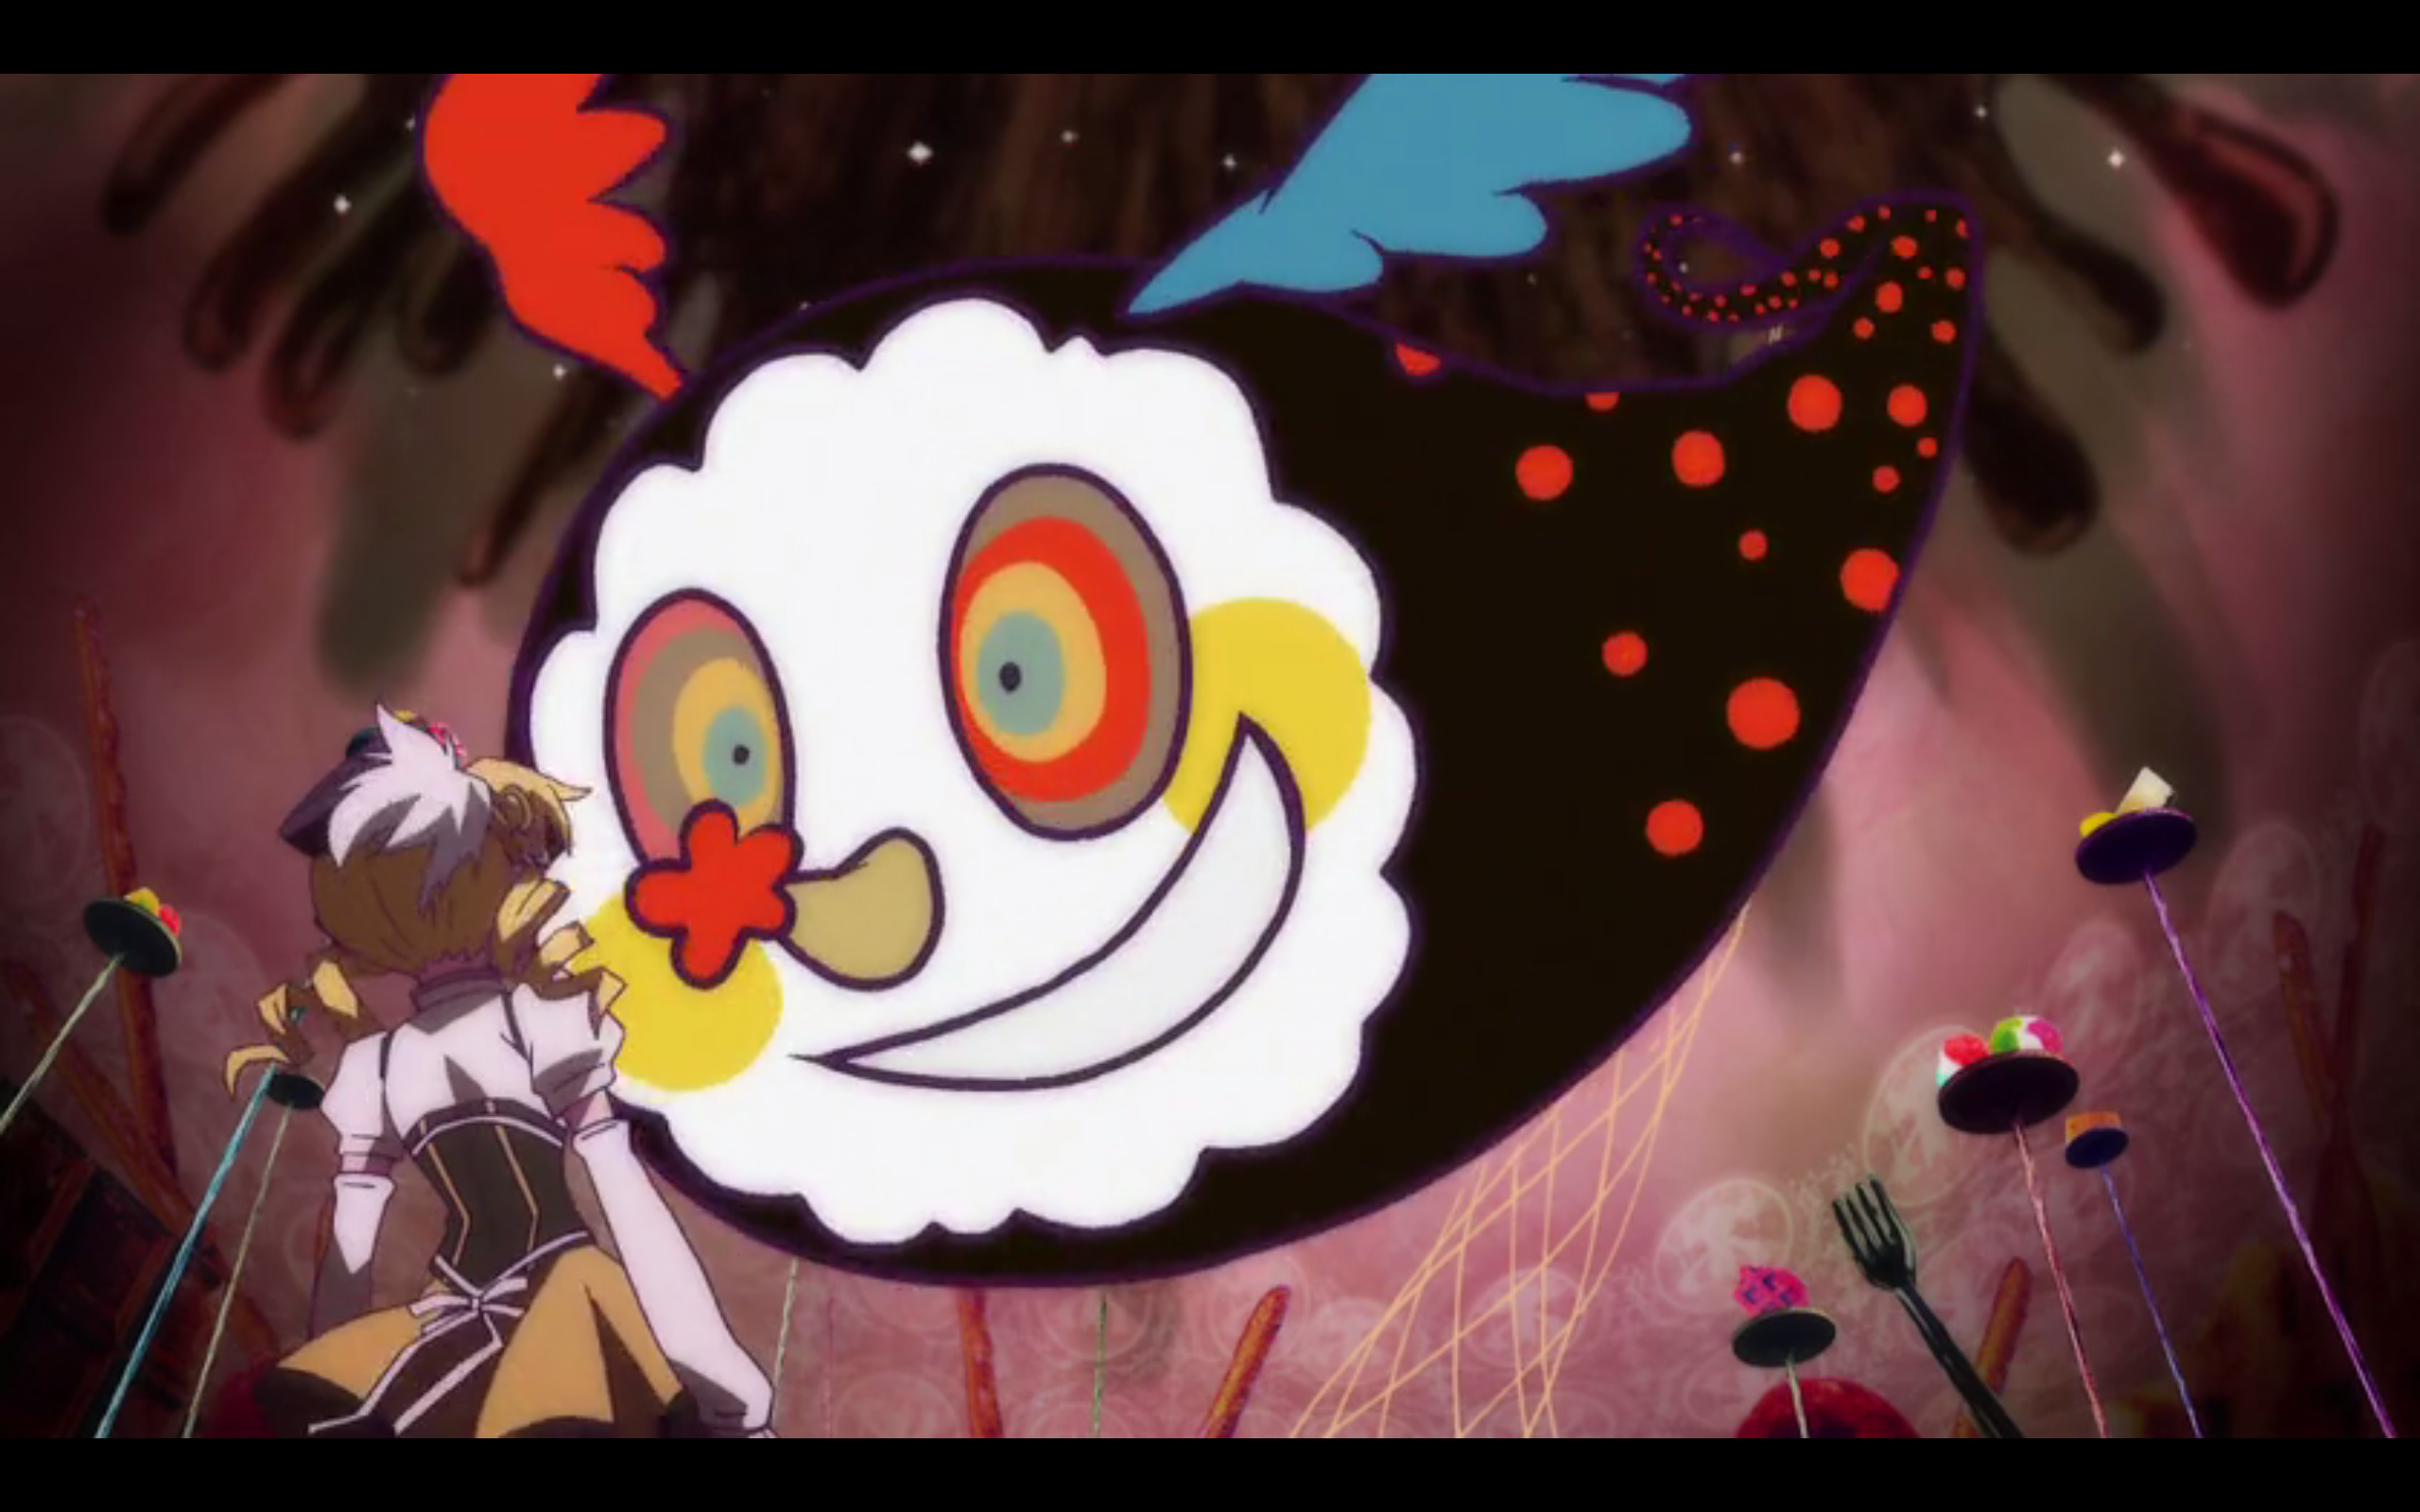 Review Puella Magi Madoka Magica The Tiny World Of An Anime Amateur